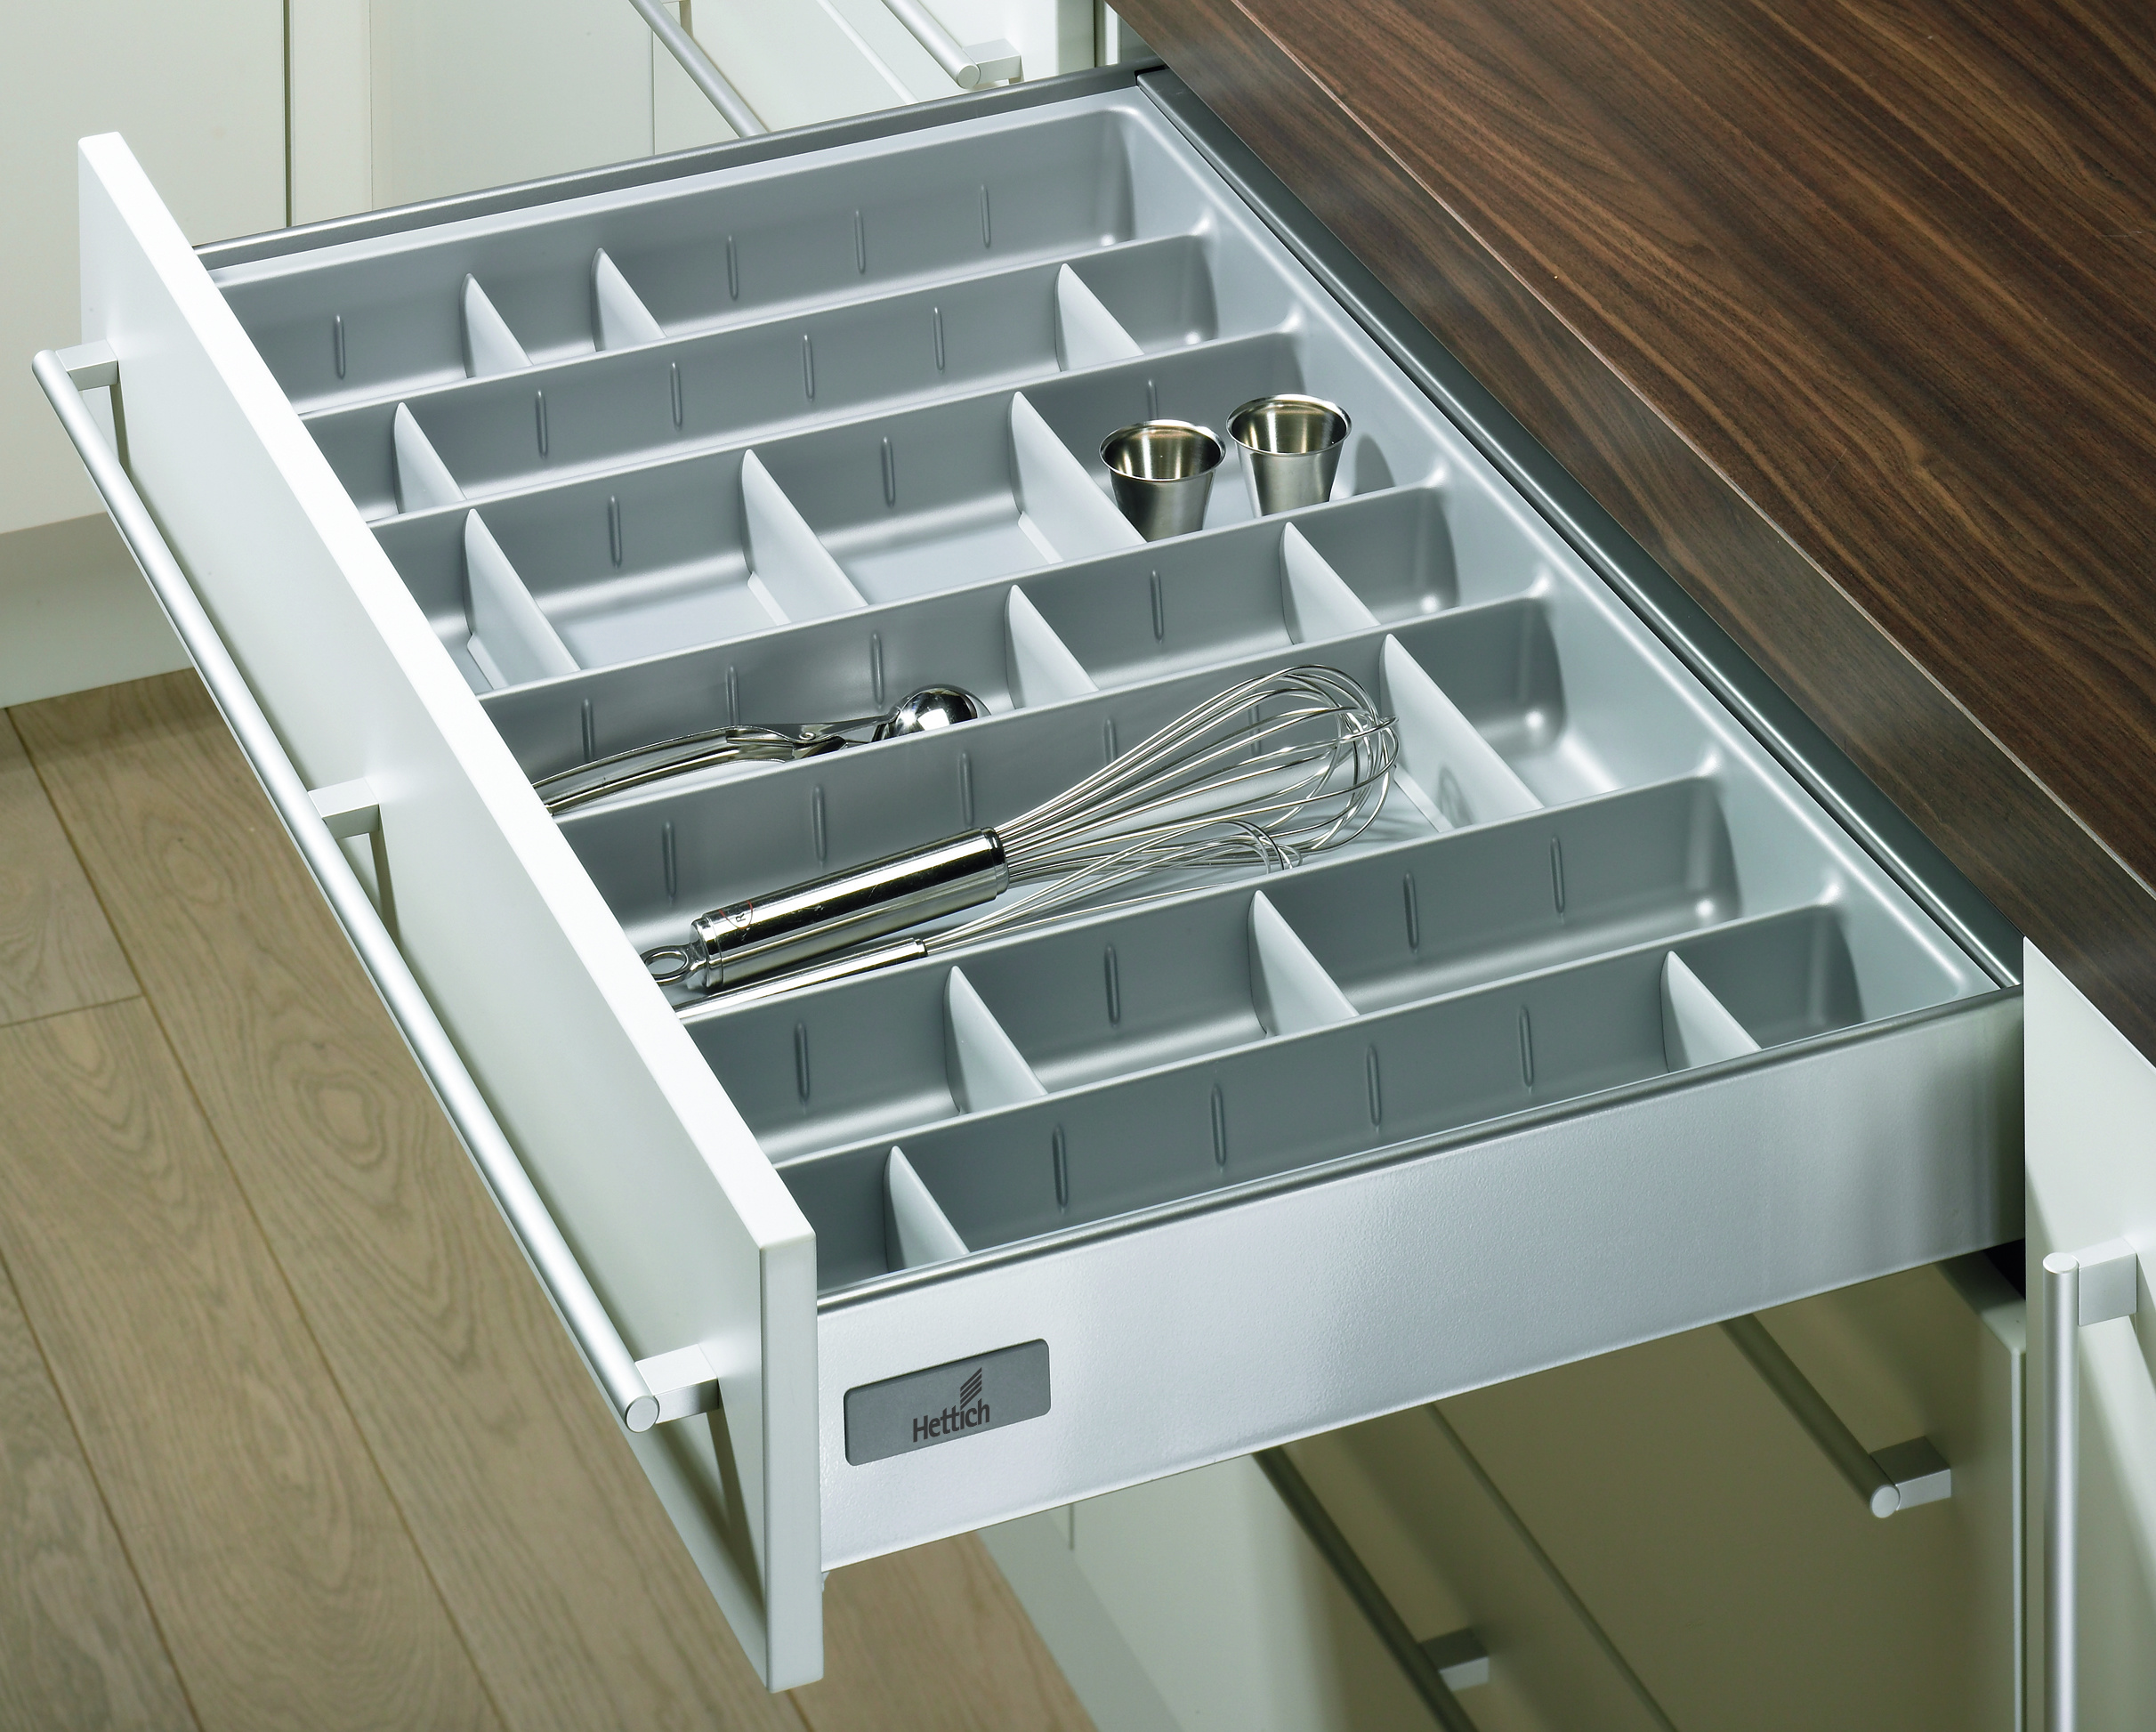 pro_cutlery_tray